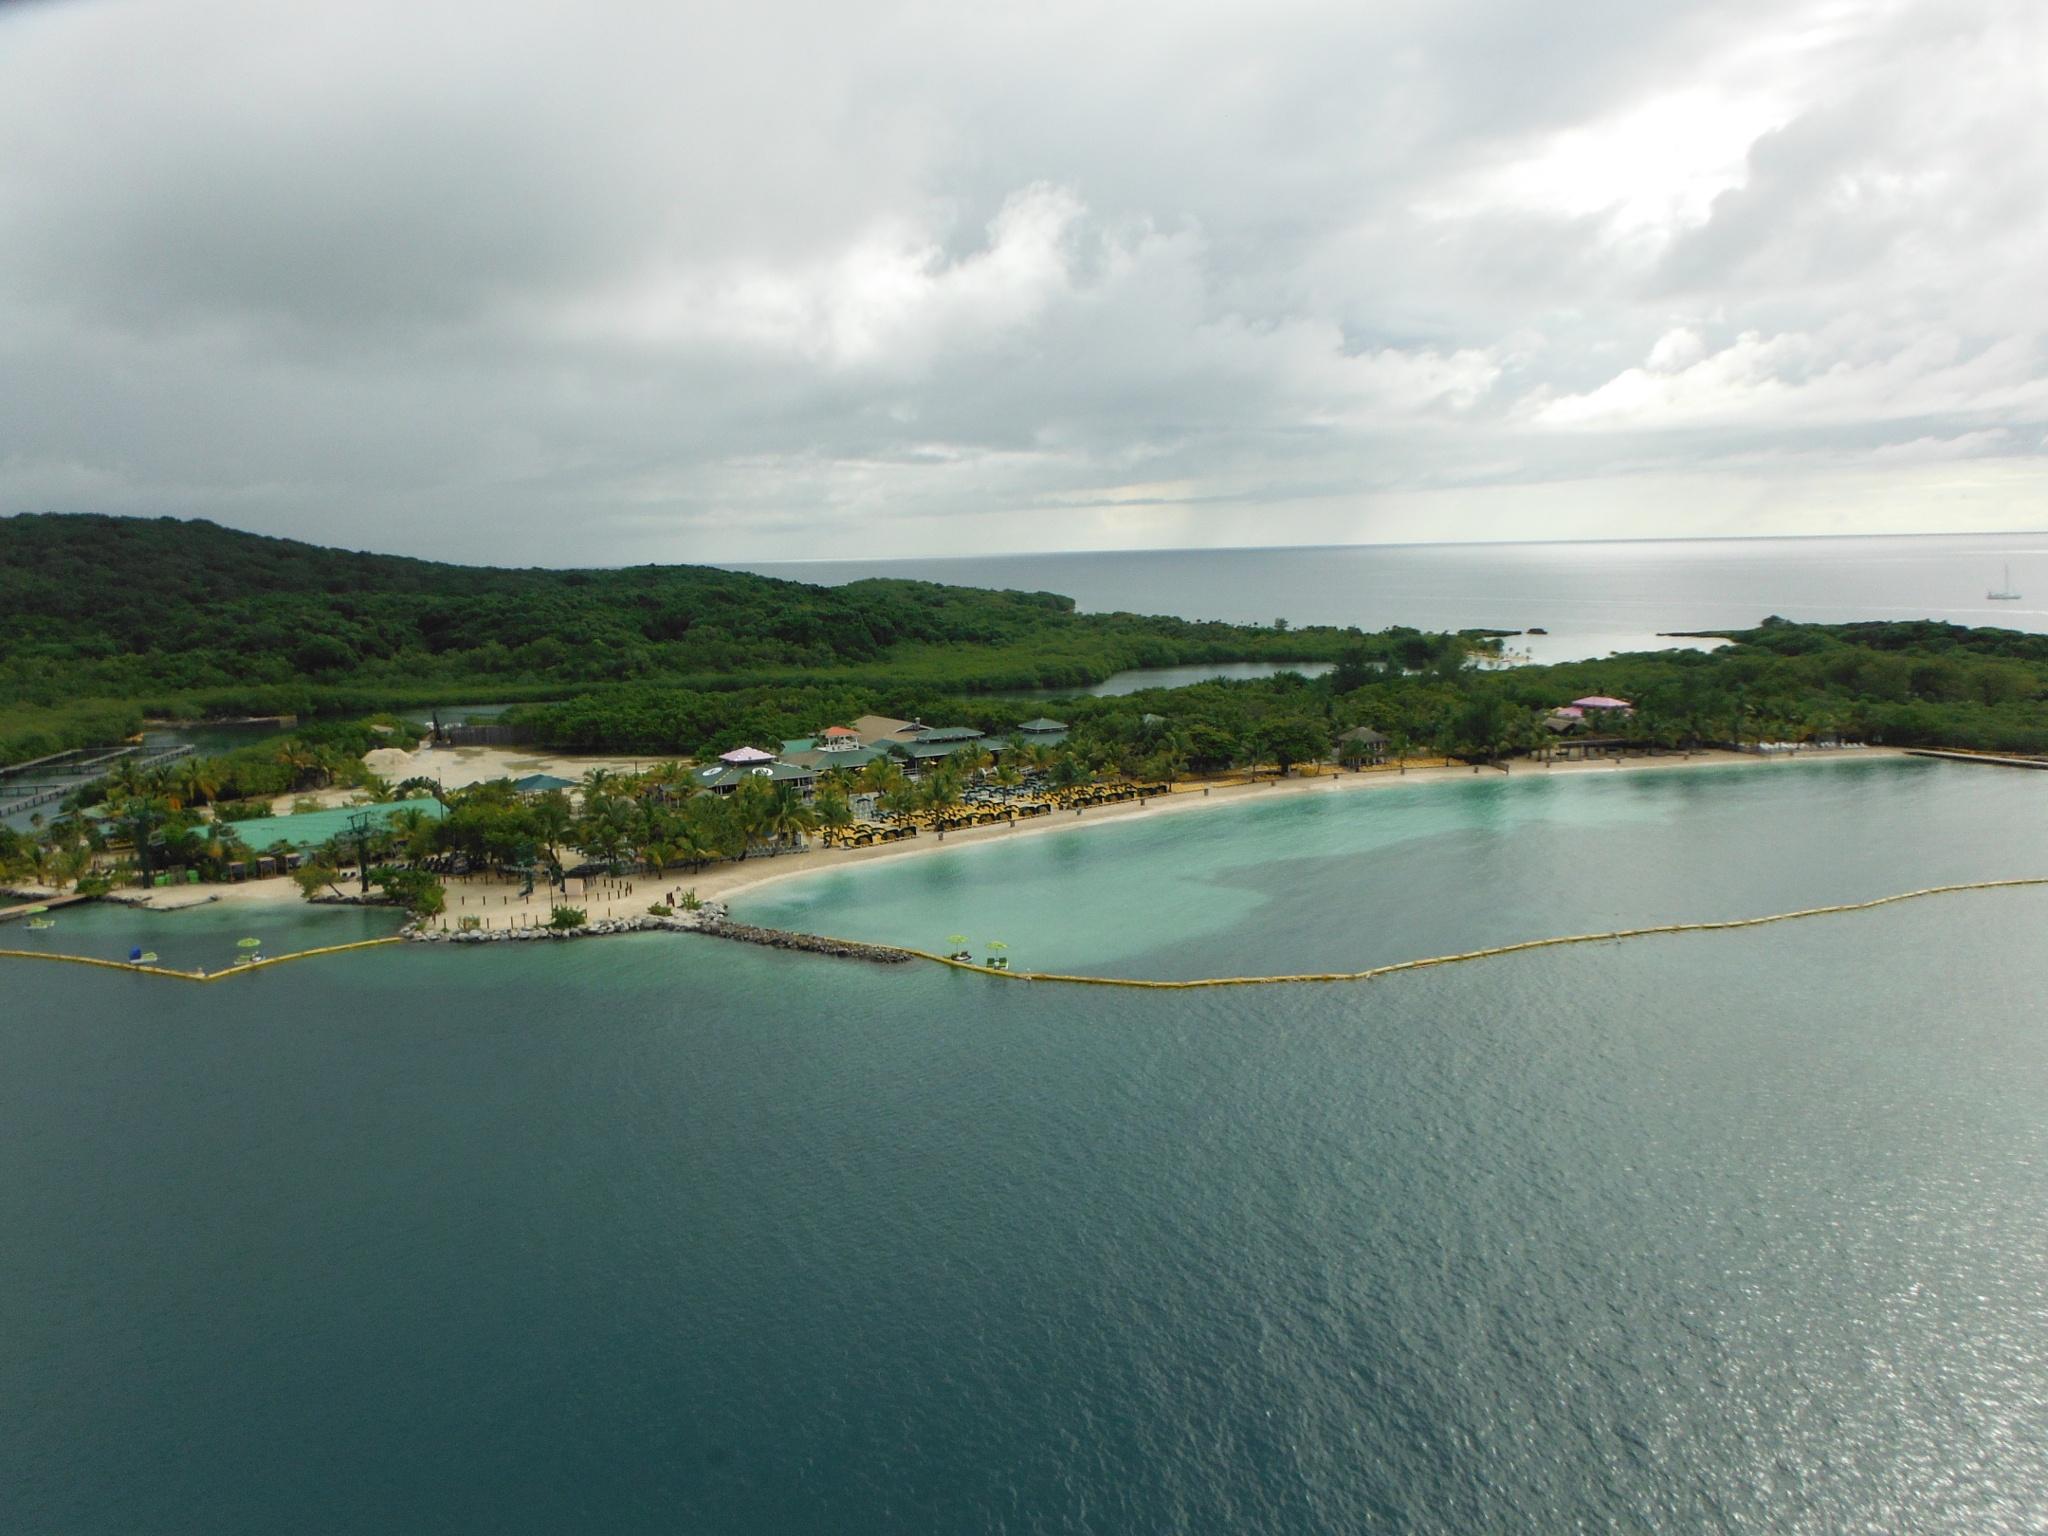 Mahogany Bay by Laura Lee Green-Kulcak